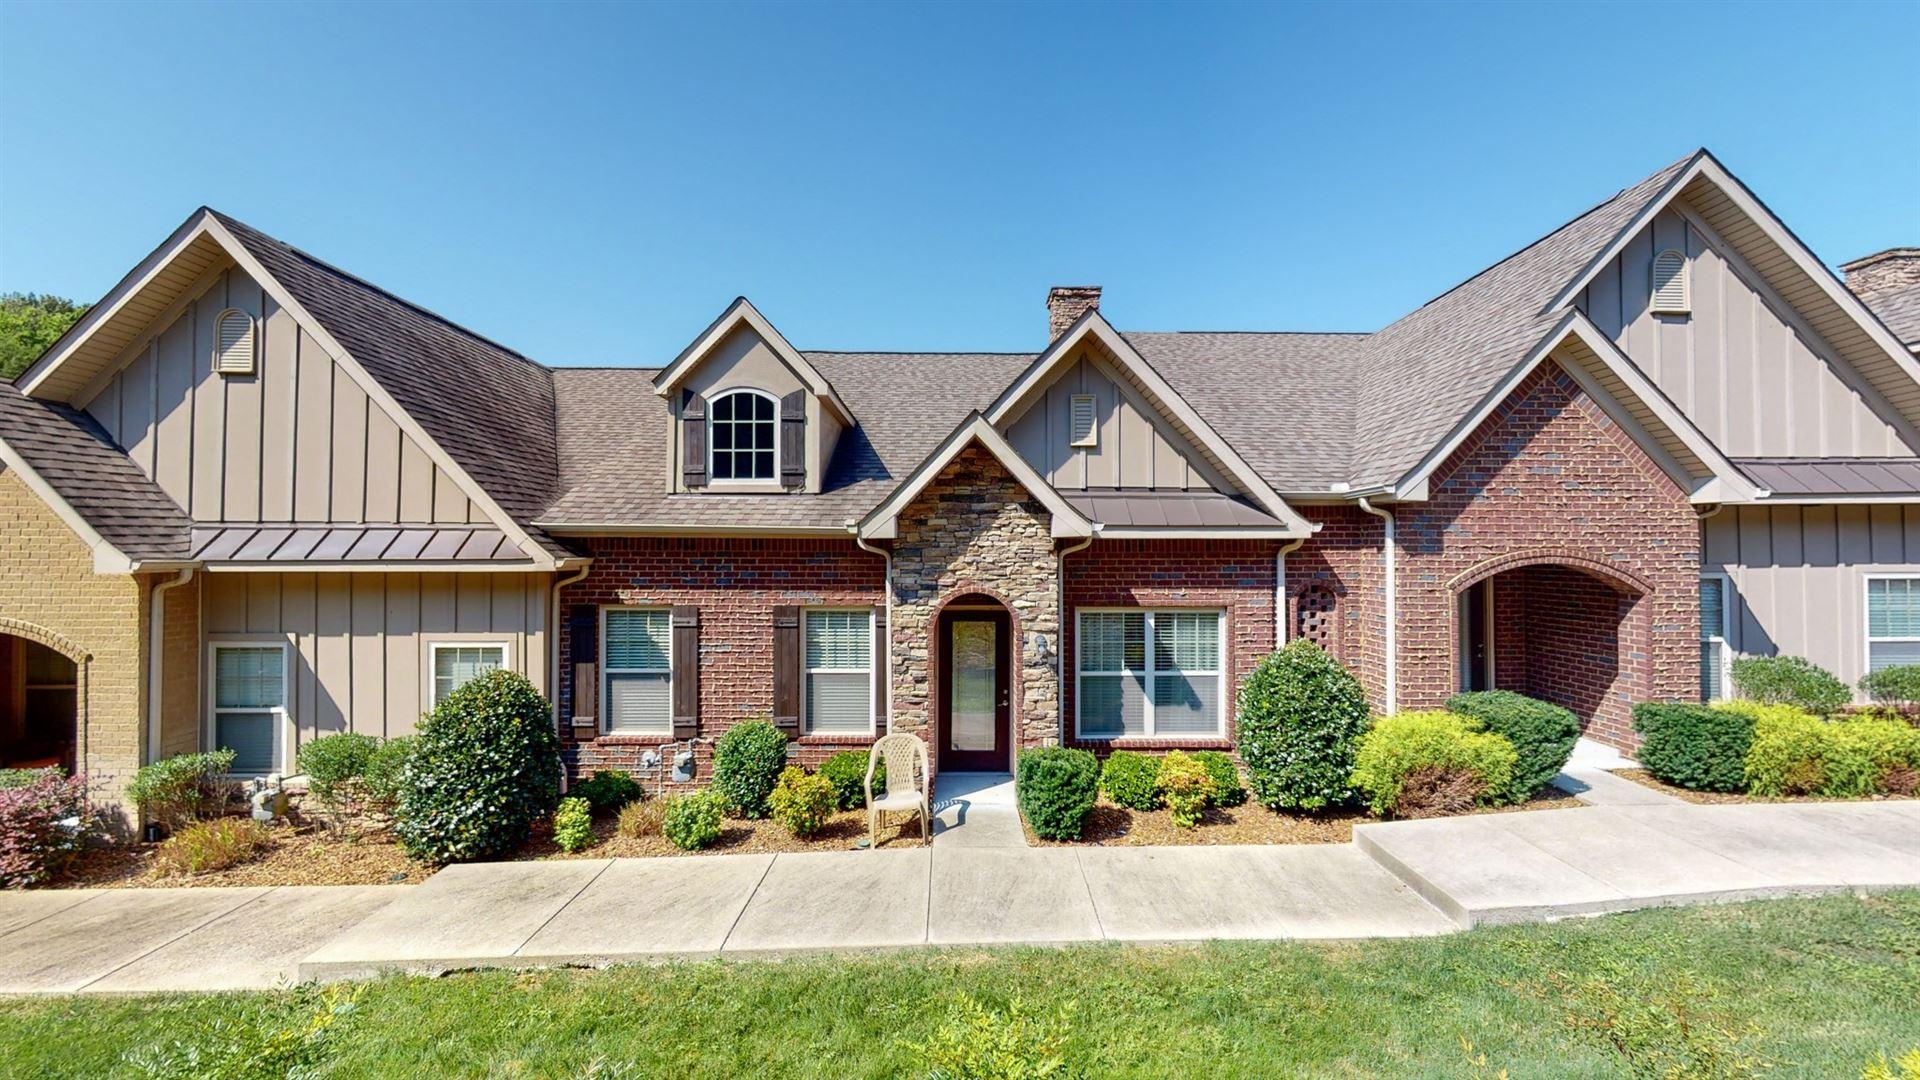 100 Placid Grove Ln #1804, Goodlettsville, TN 37072 - MLS#: 2210212